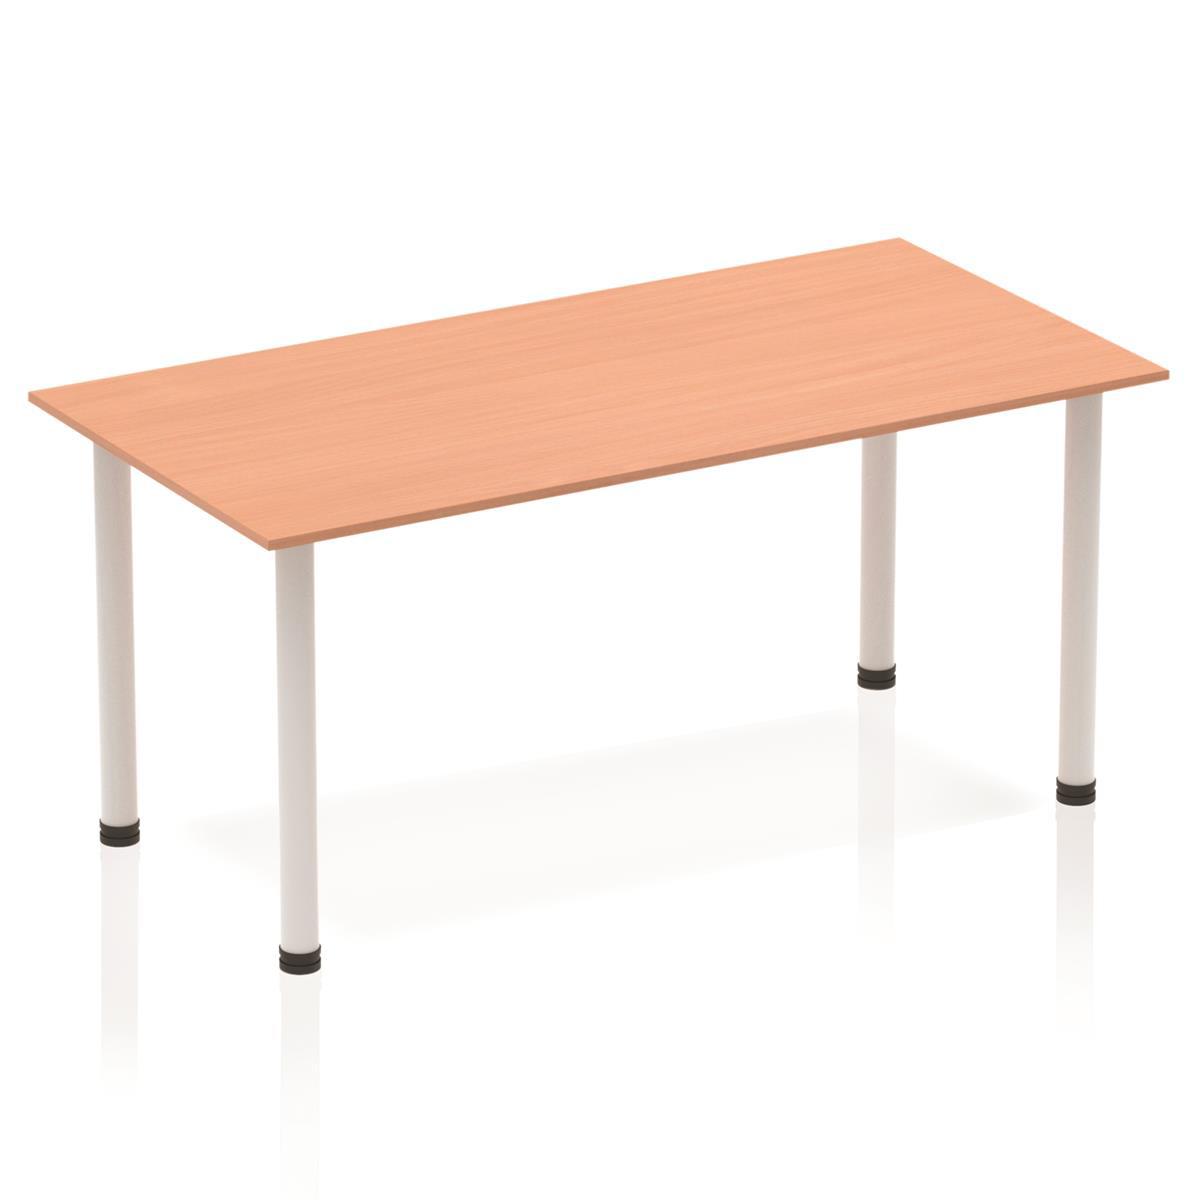 Sonix Rectangular Silver Post Leg Table 1600x800mm Beech Ref BF00168